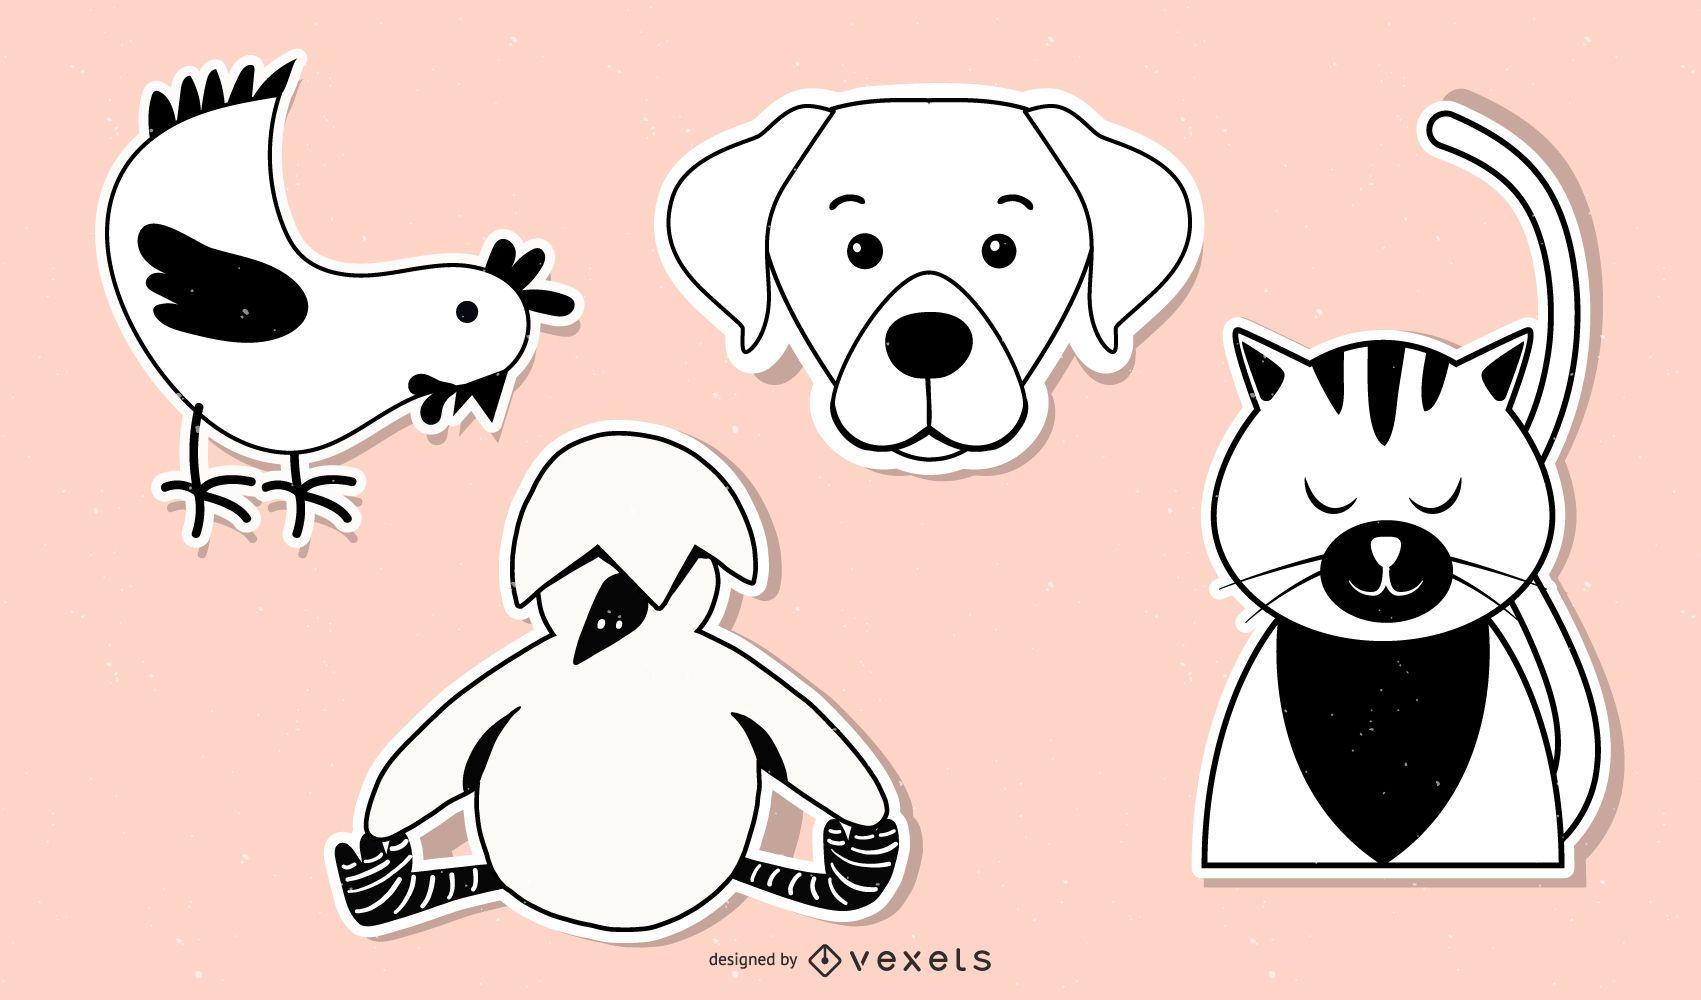 Iconos de personajes de arte de etiqueta engomada